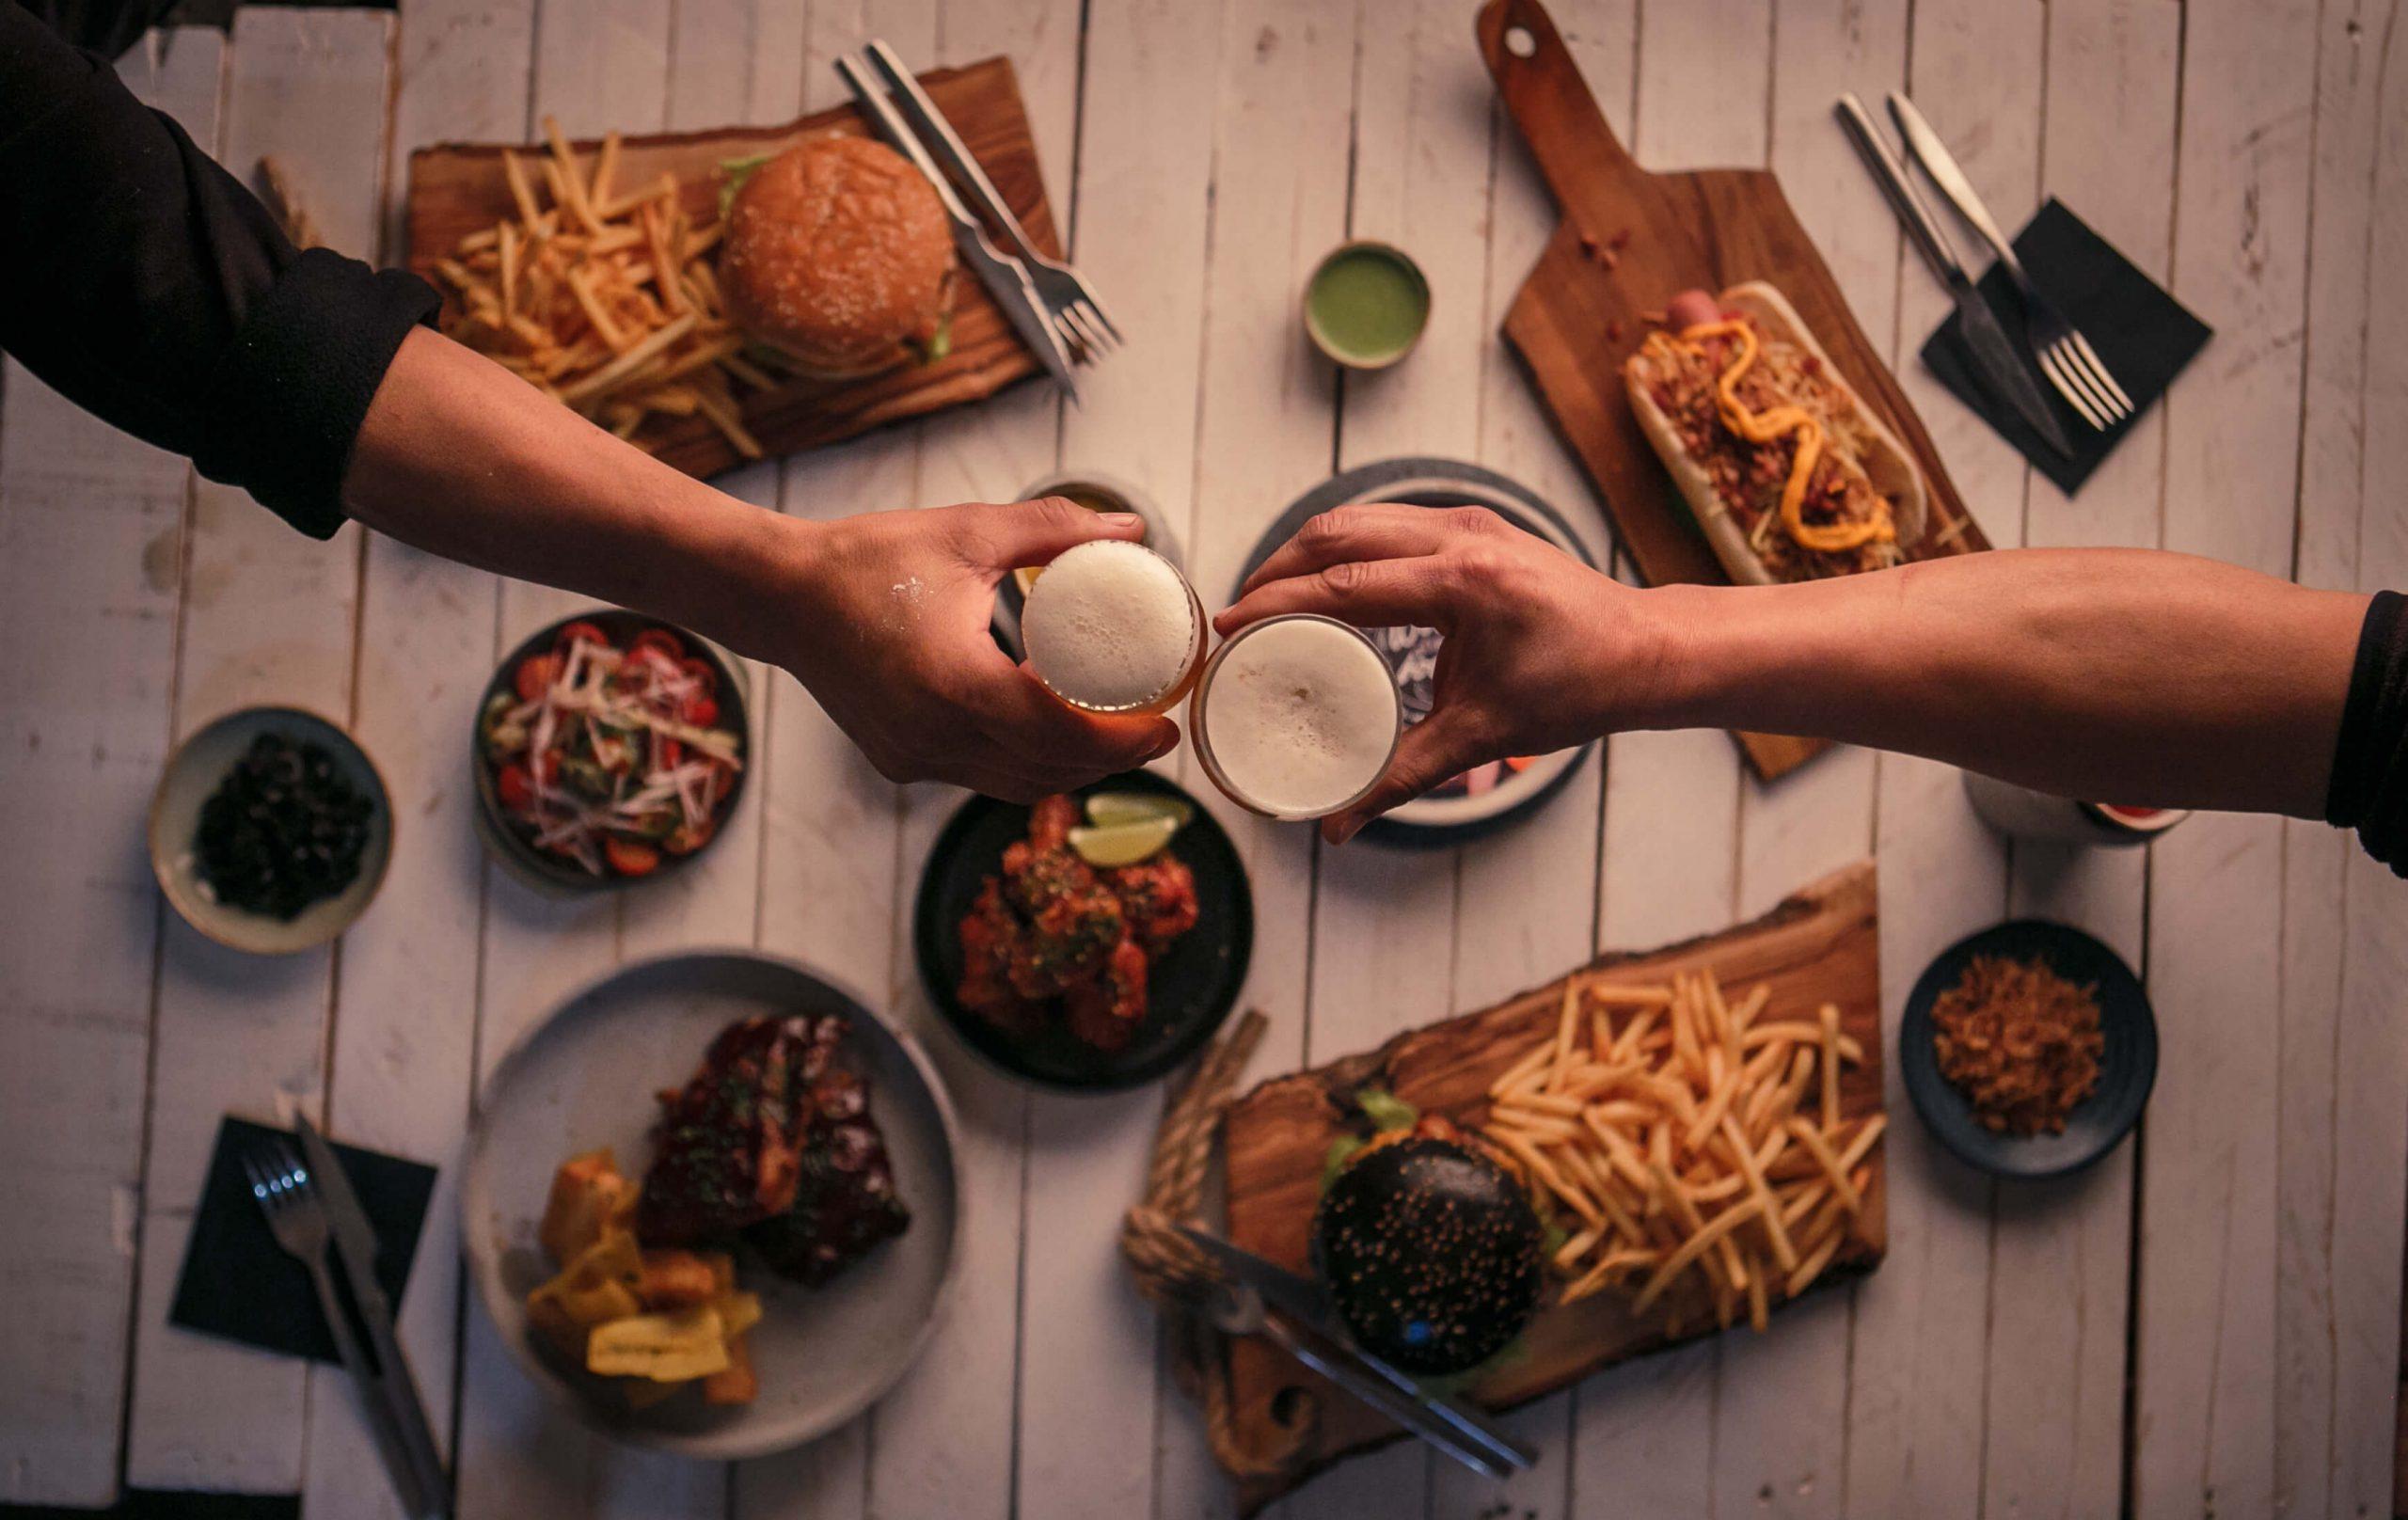 World of food - MAD-126